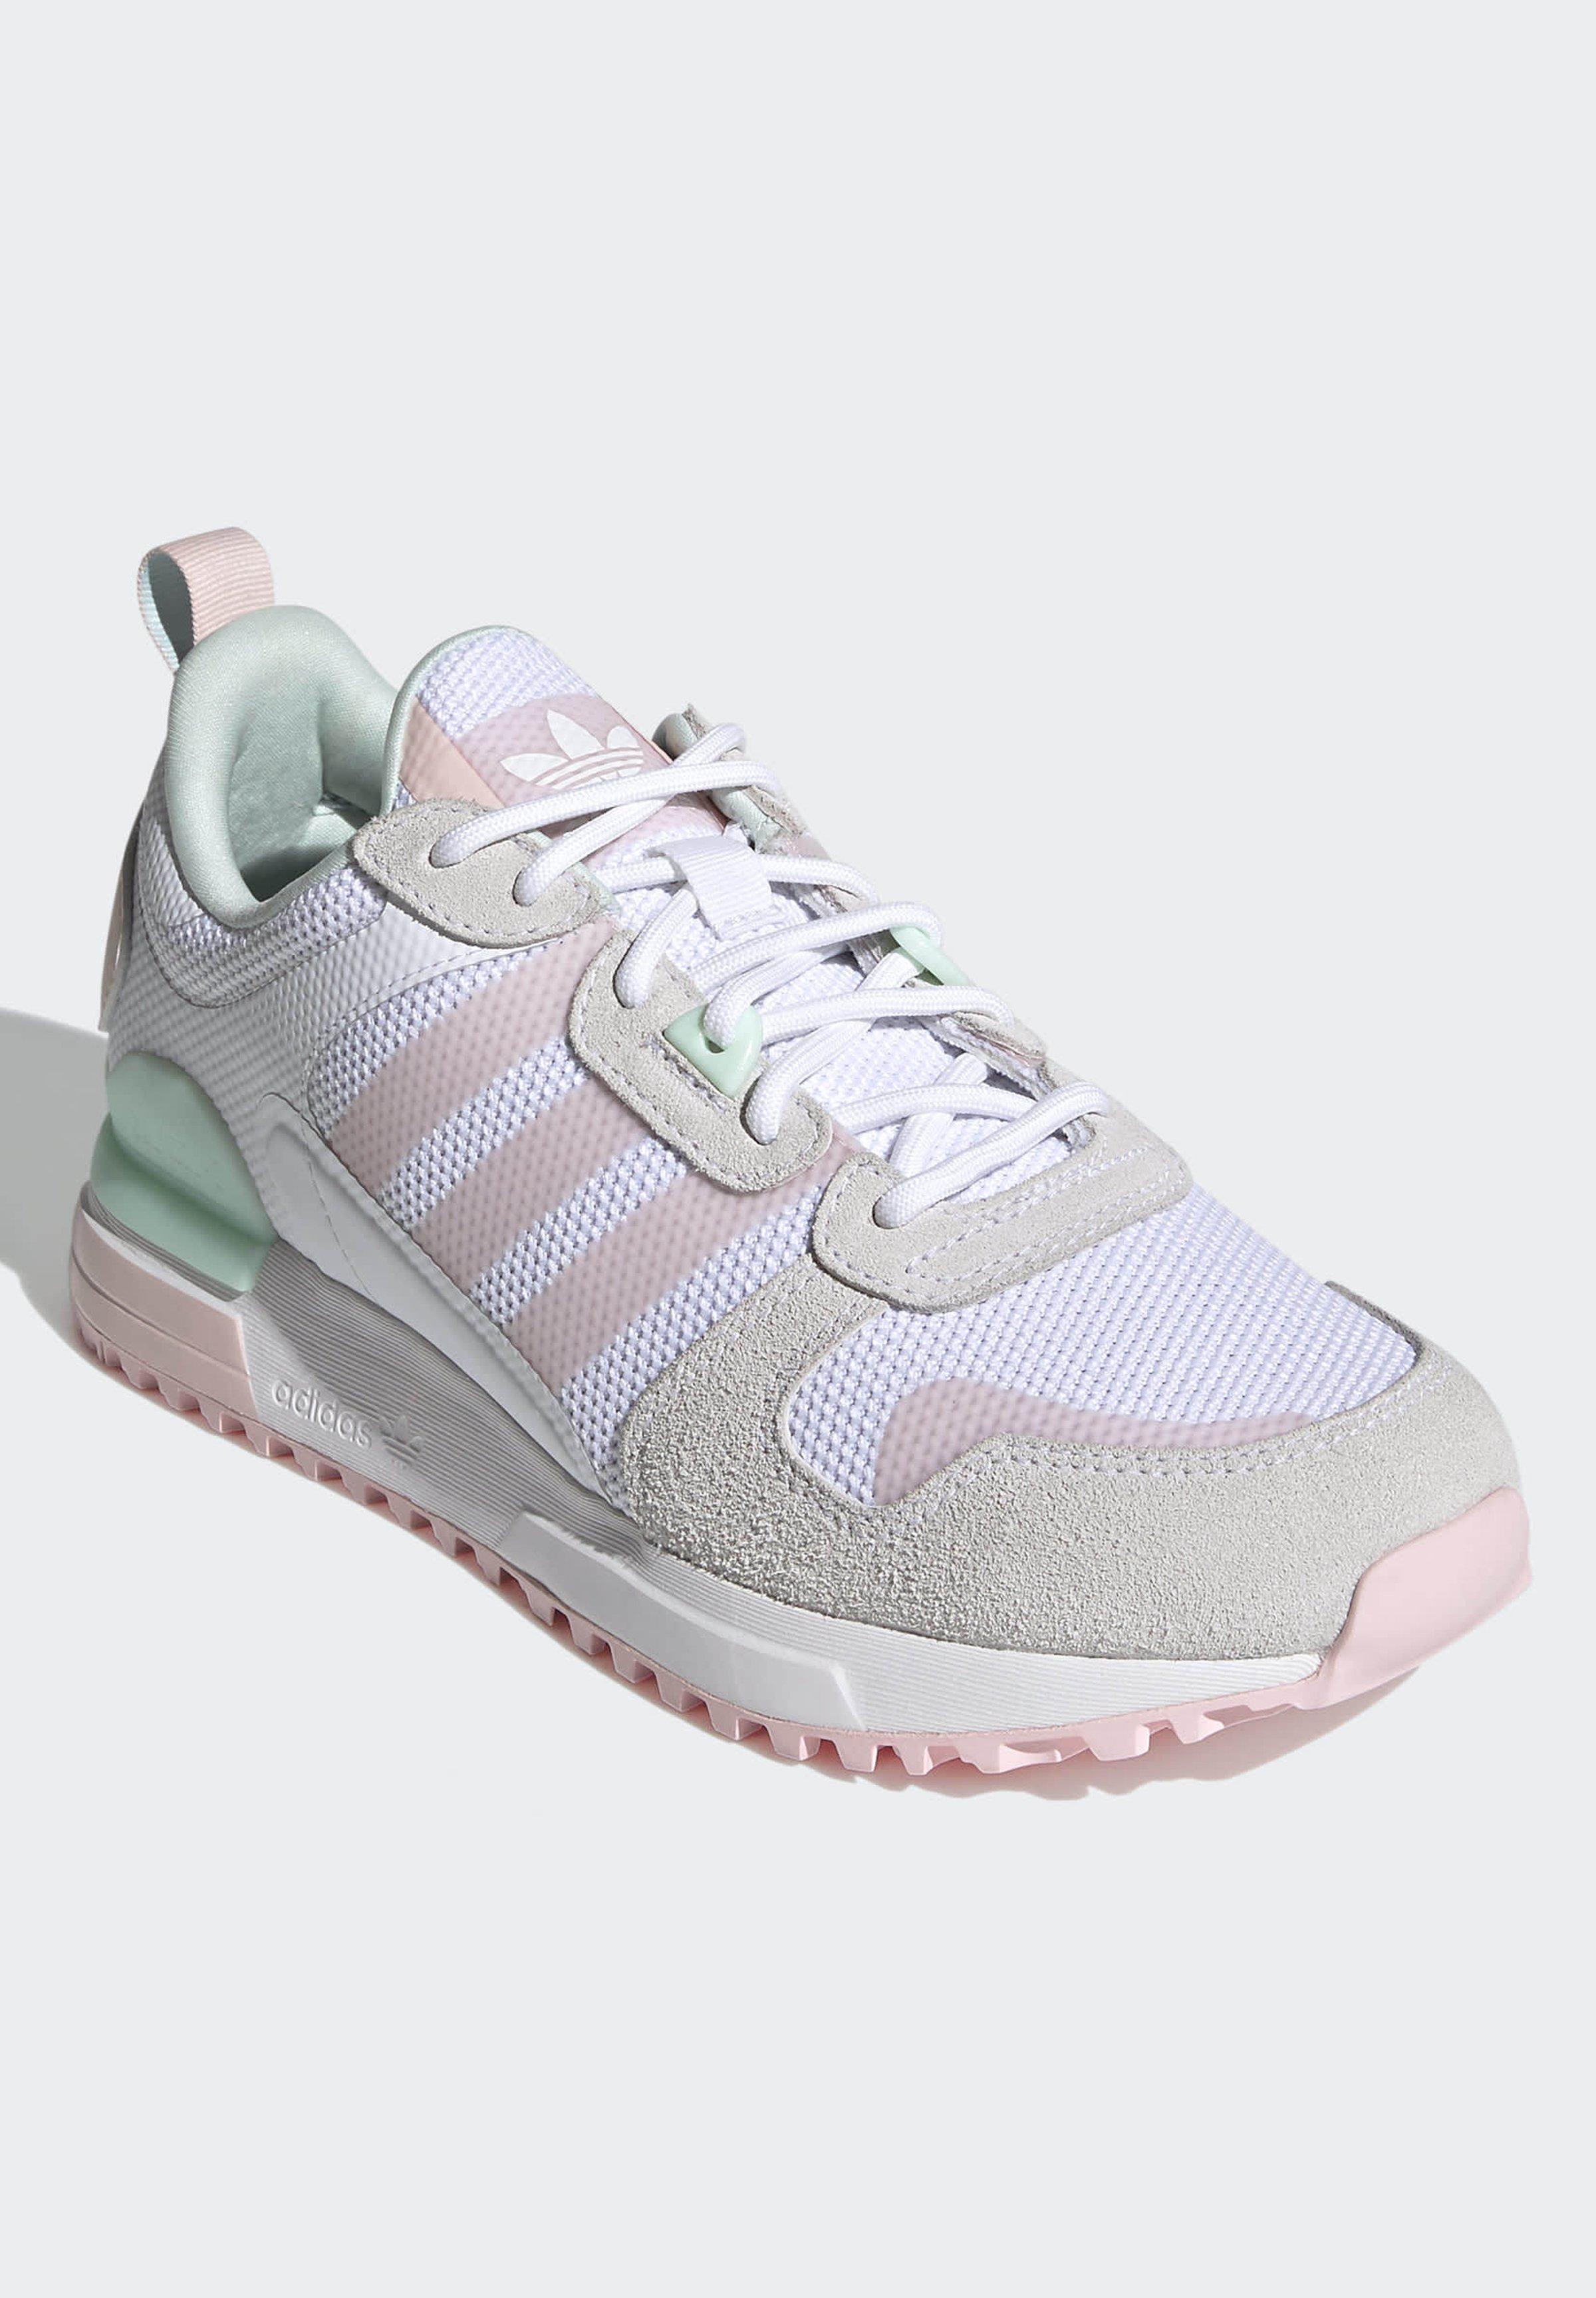 adidas Originals ZX Sneaker low ftwr white icey pink f ice mint/weiß